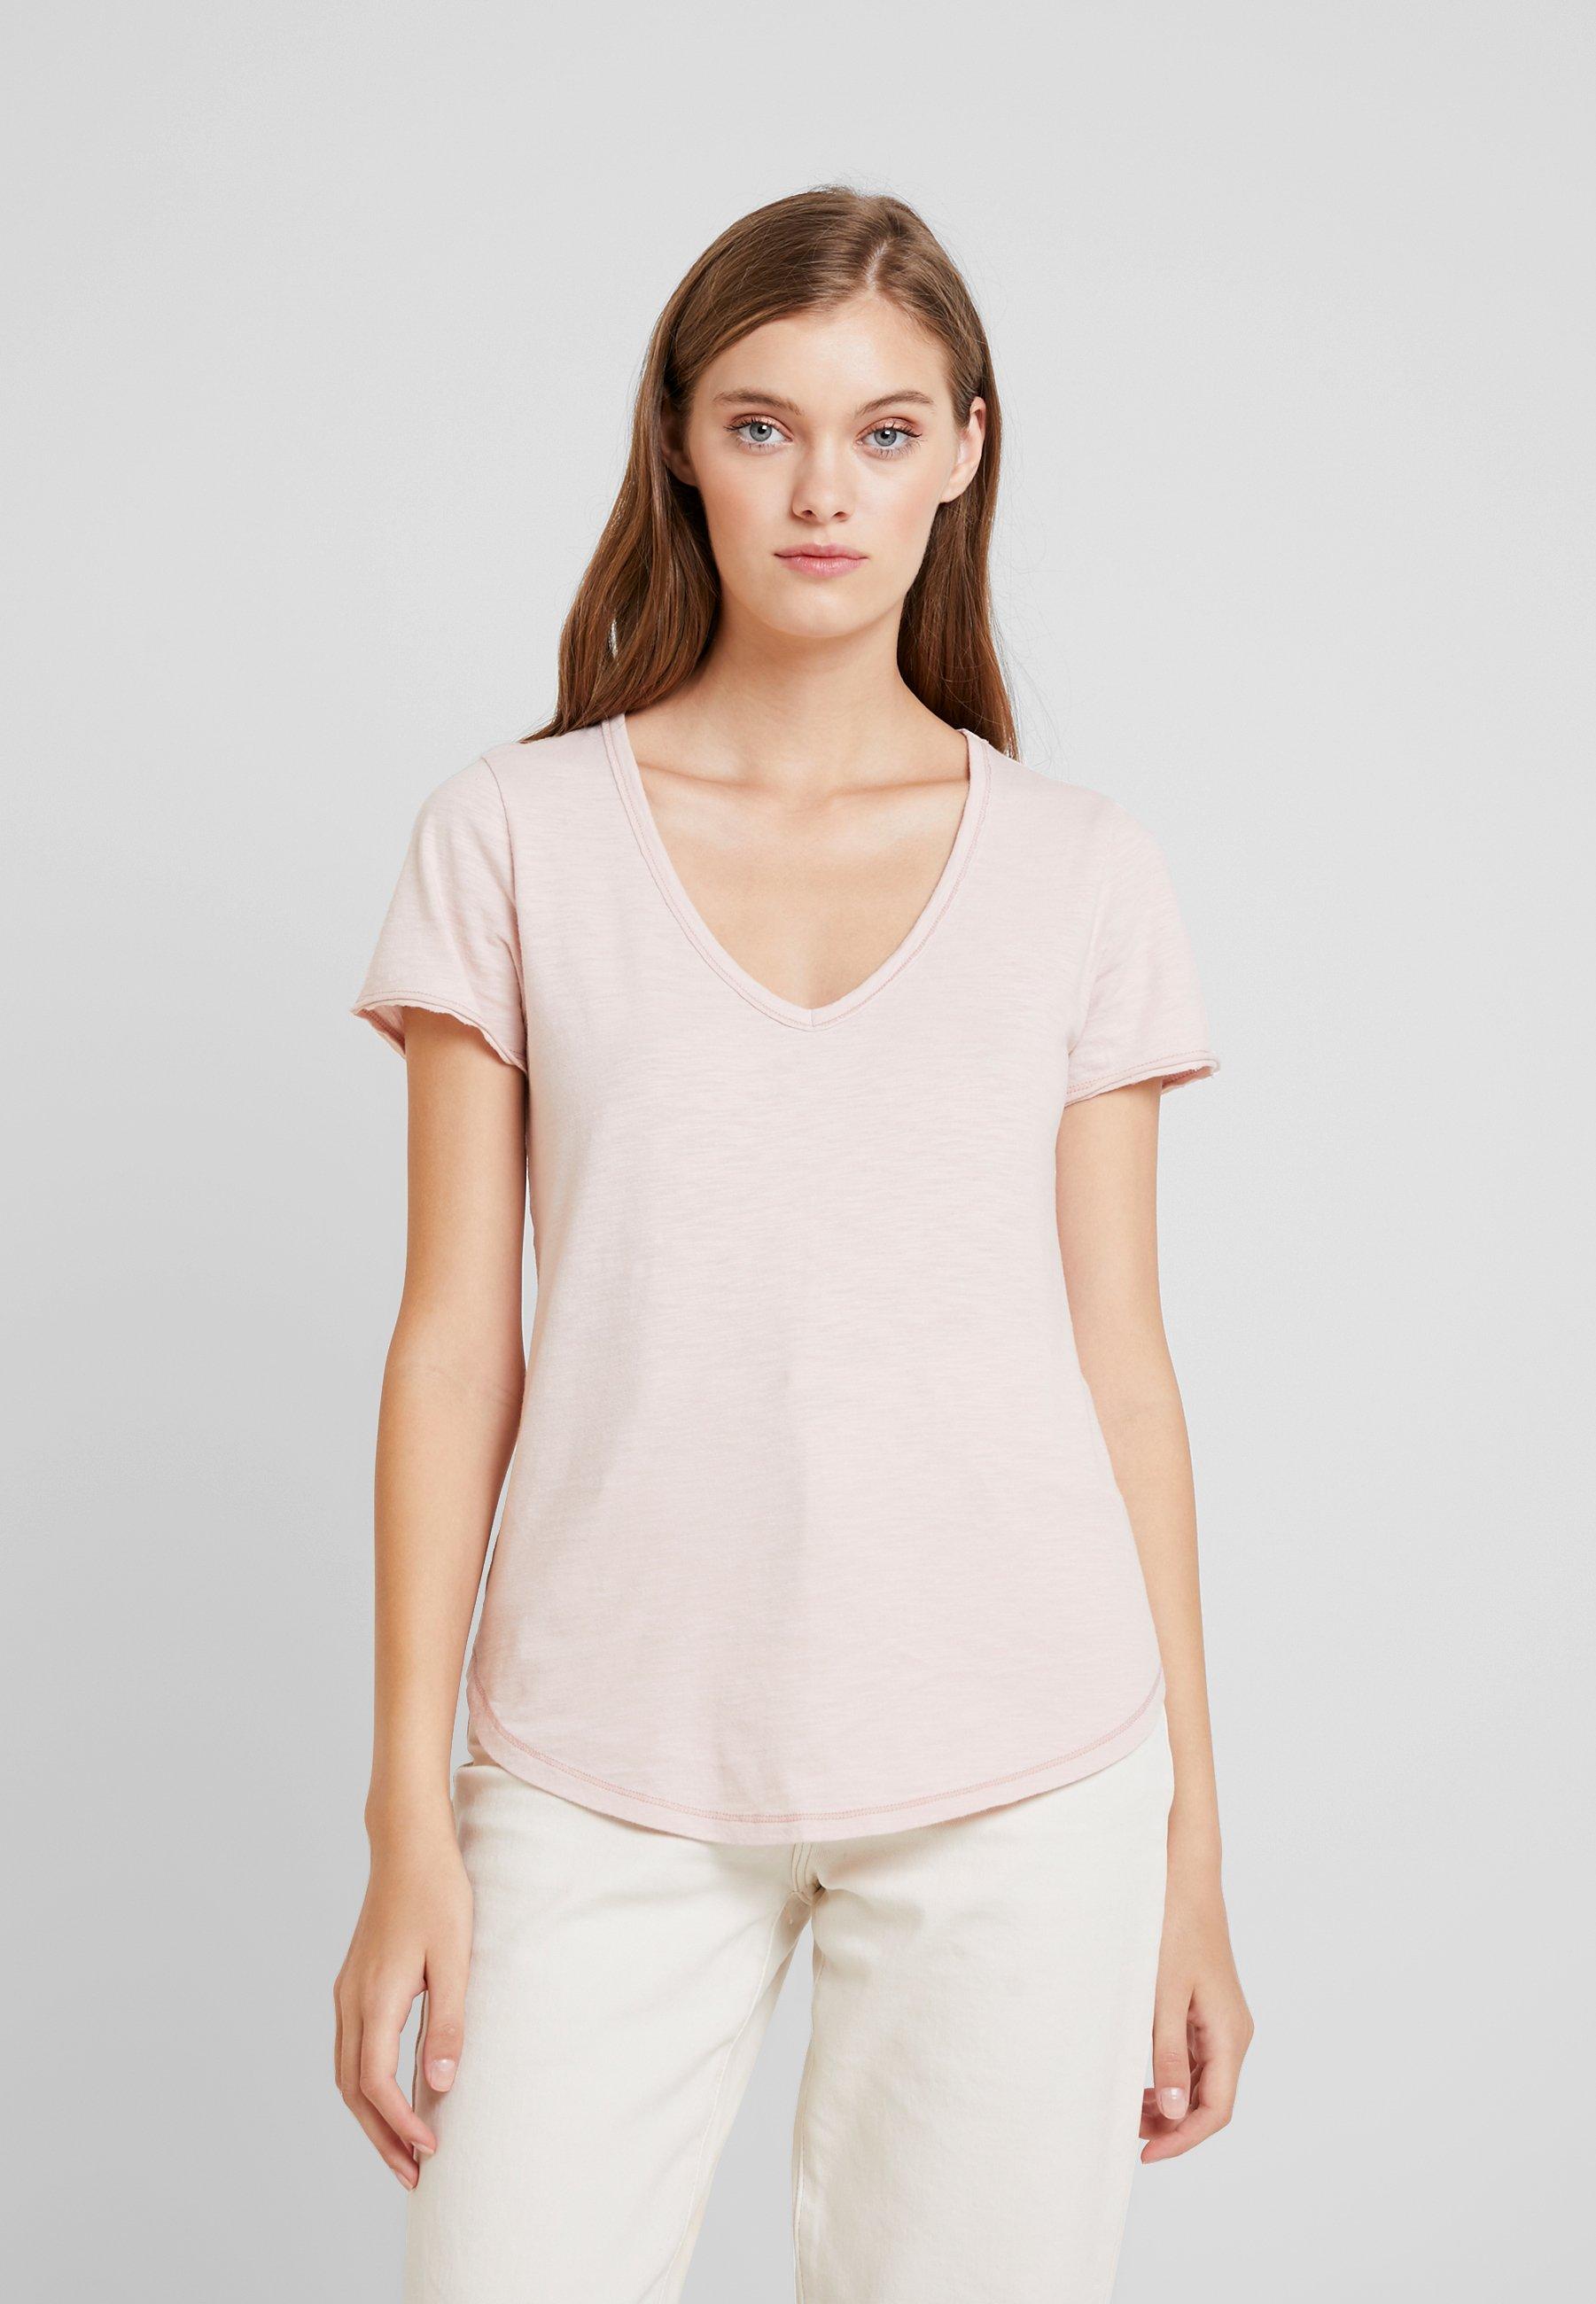 Abercrombieamp; TeeT shirt Basic Fitch Soft Pink 1FKJTlc